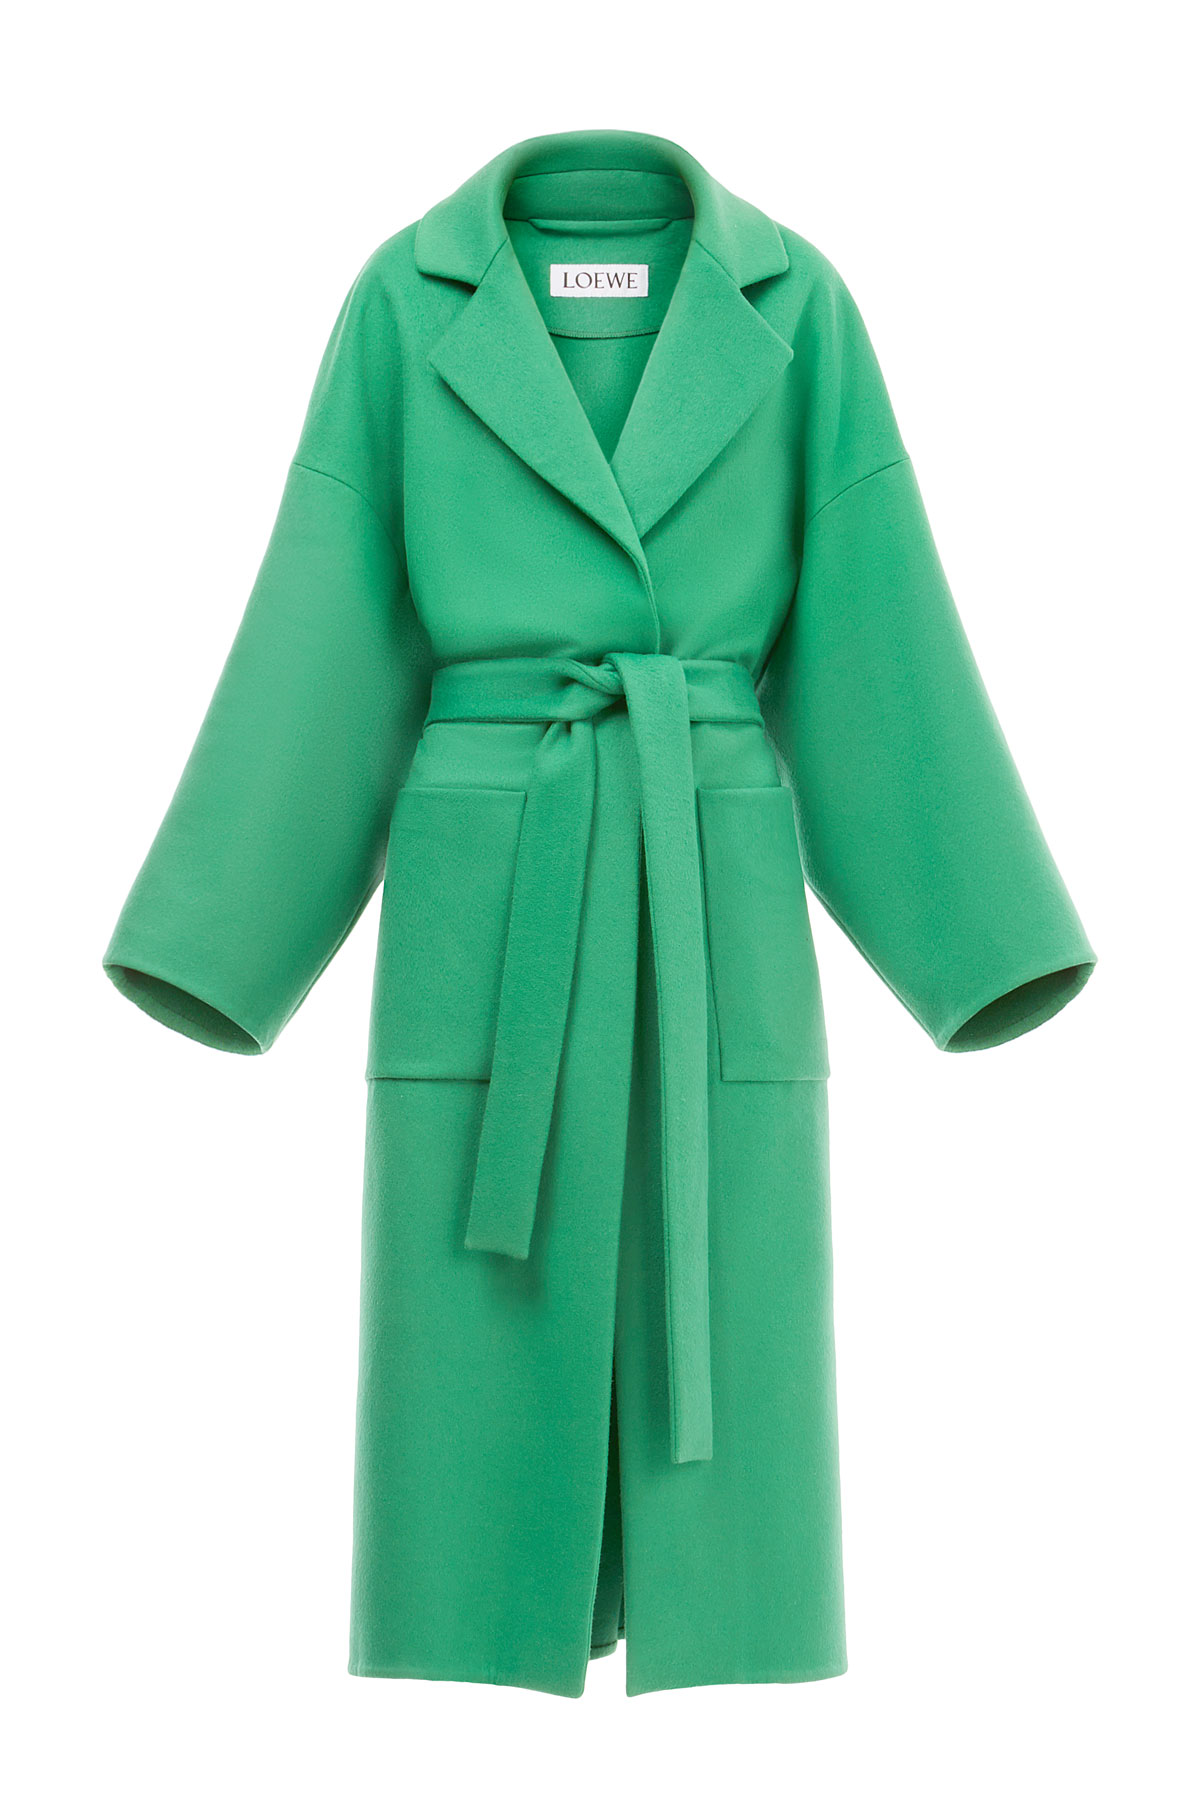 LOEWE Oversize Belted Coat 绿色 front